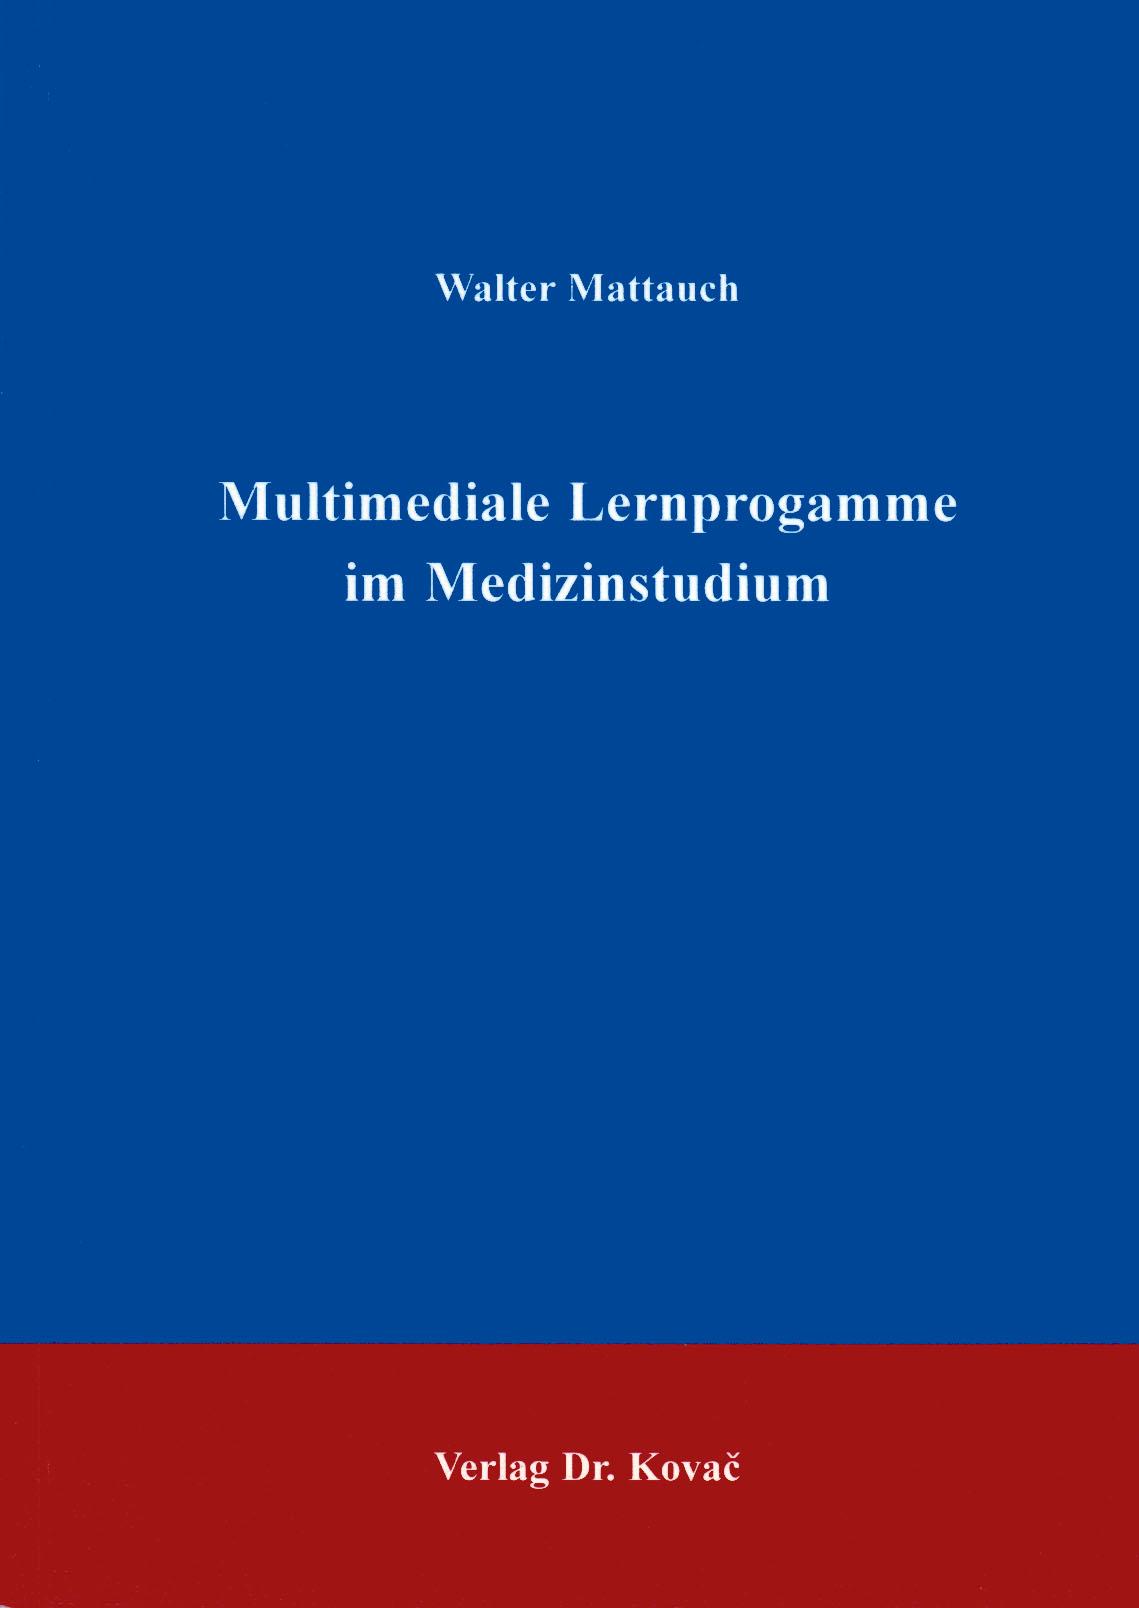 Cover: Multimediale Lernprogramme im Medizinstudium